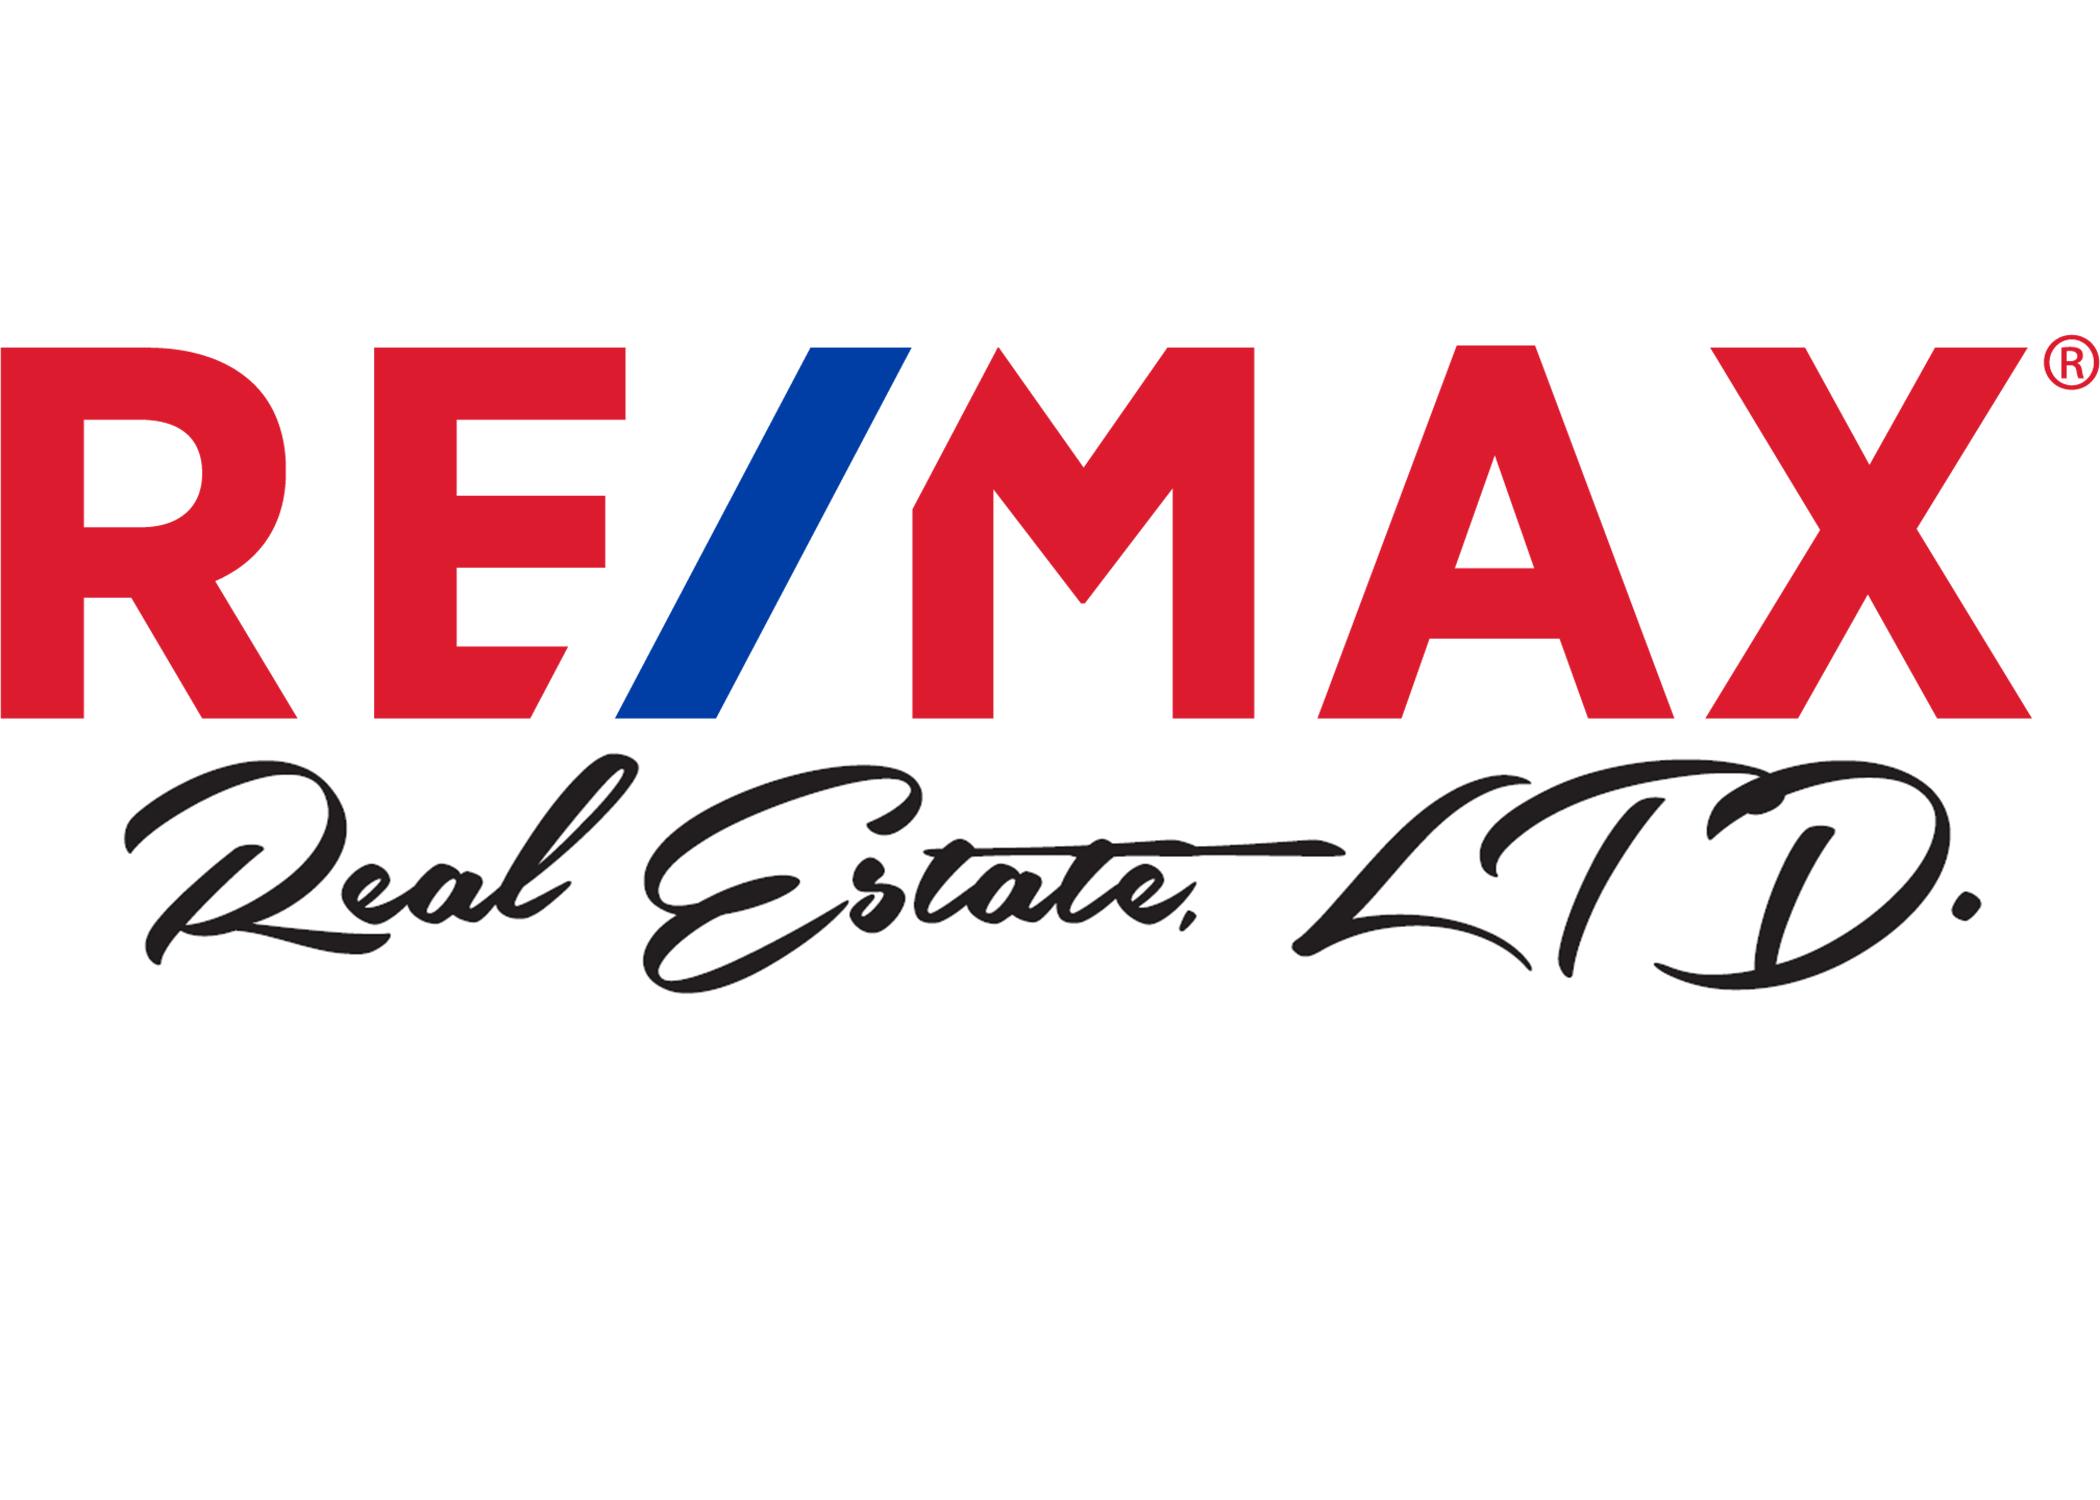 RE/MAX Real Estate LTD.